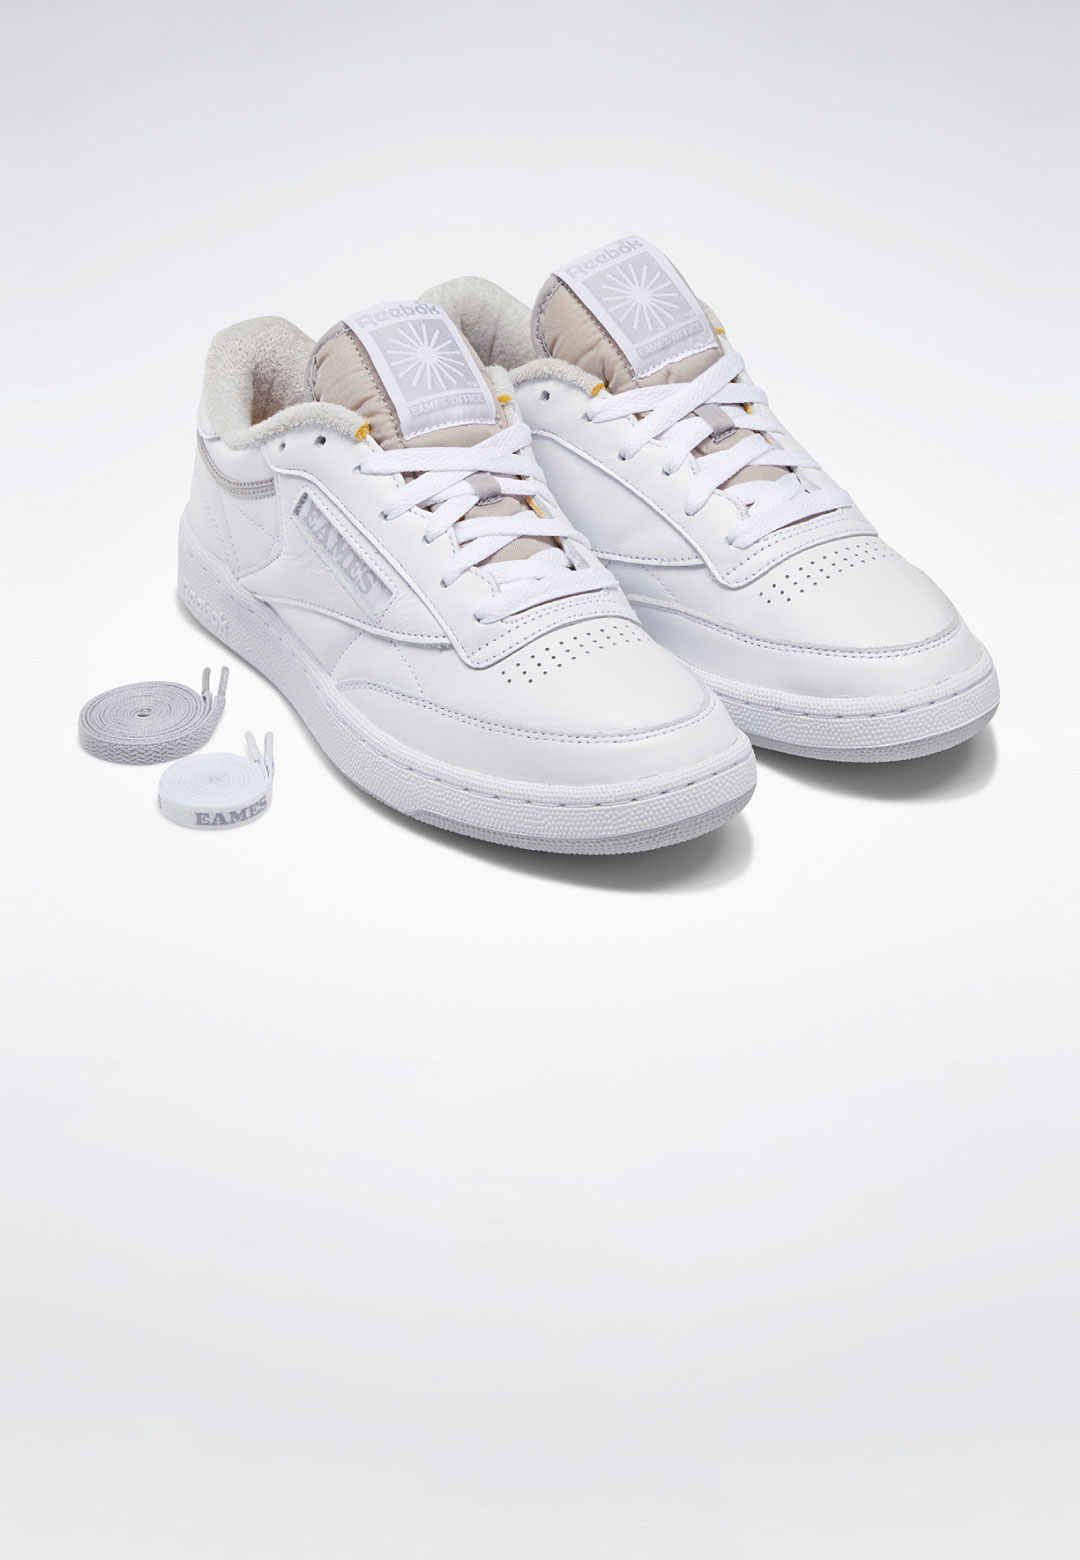 Reebok x Eames Club C Monotone Pack sneaker collection   Reebok x Eames Club C Monotone Pack   STIRworld